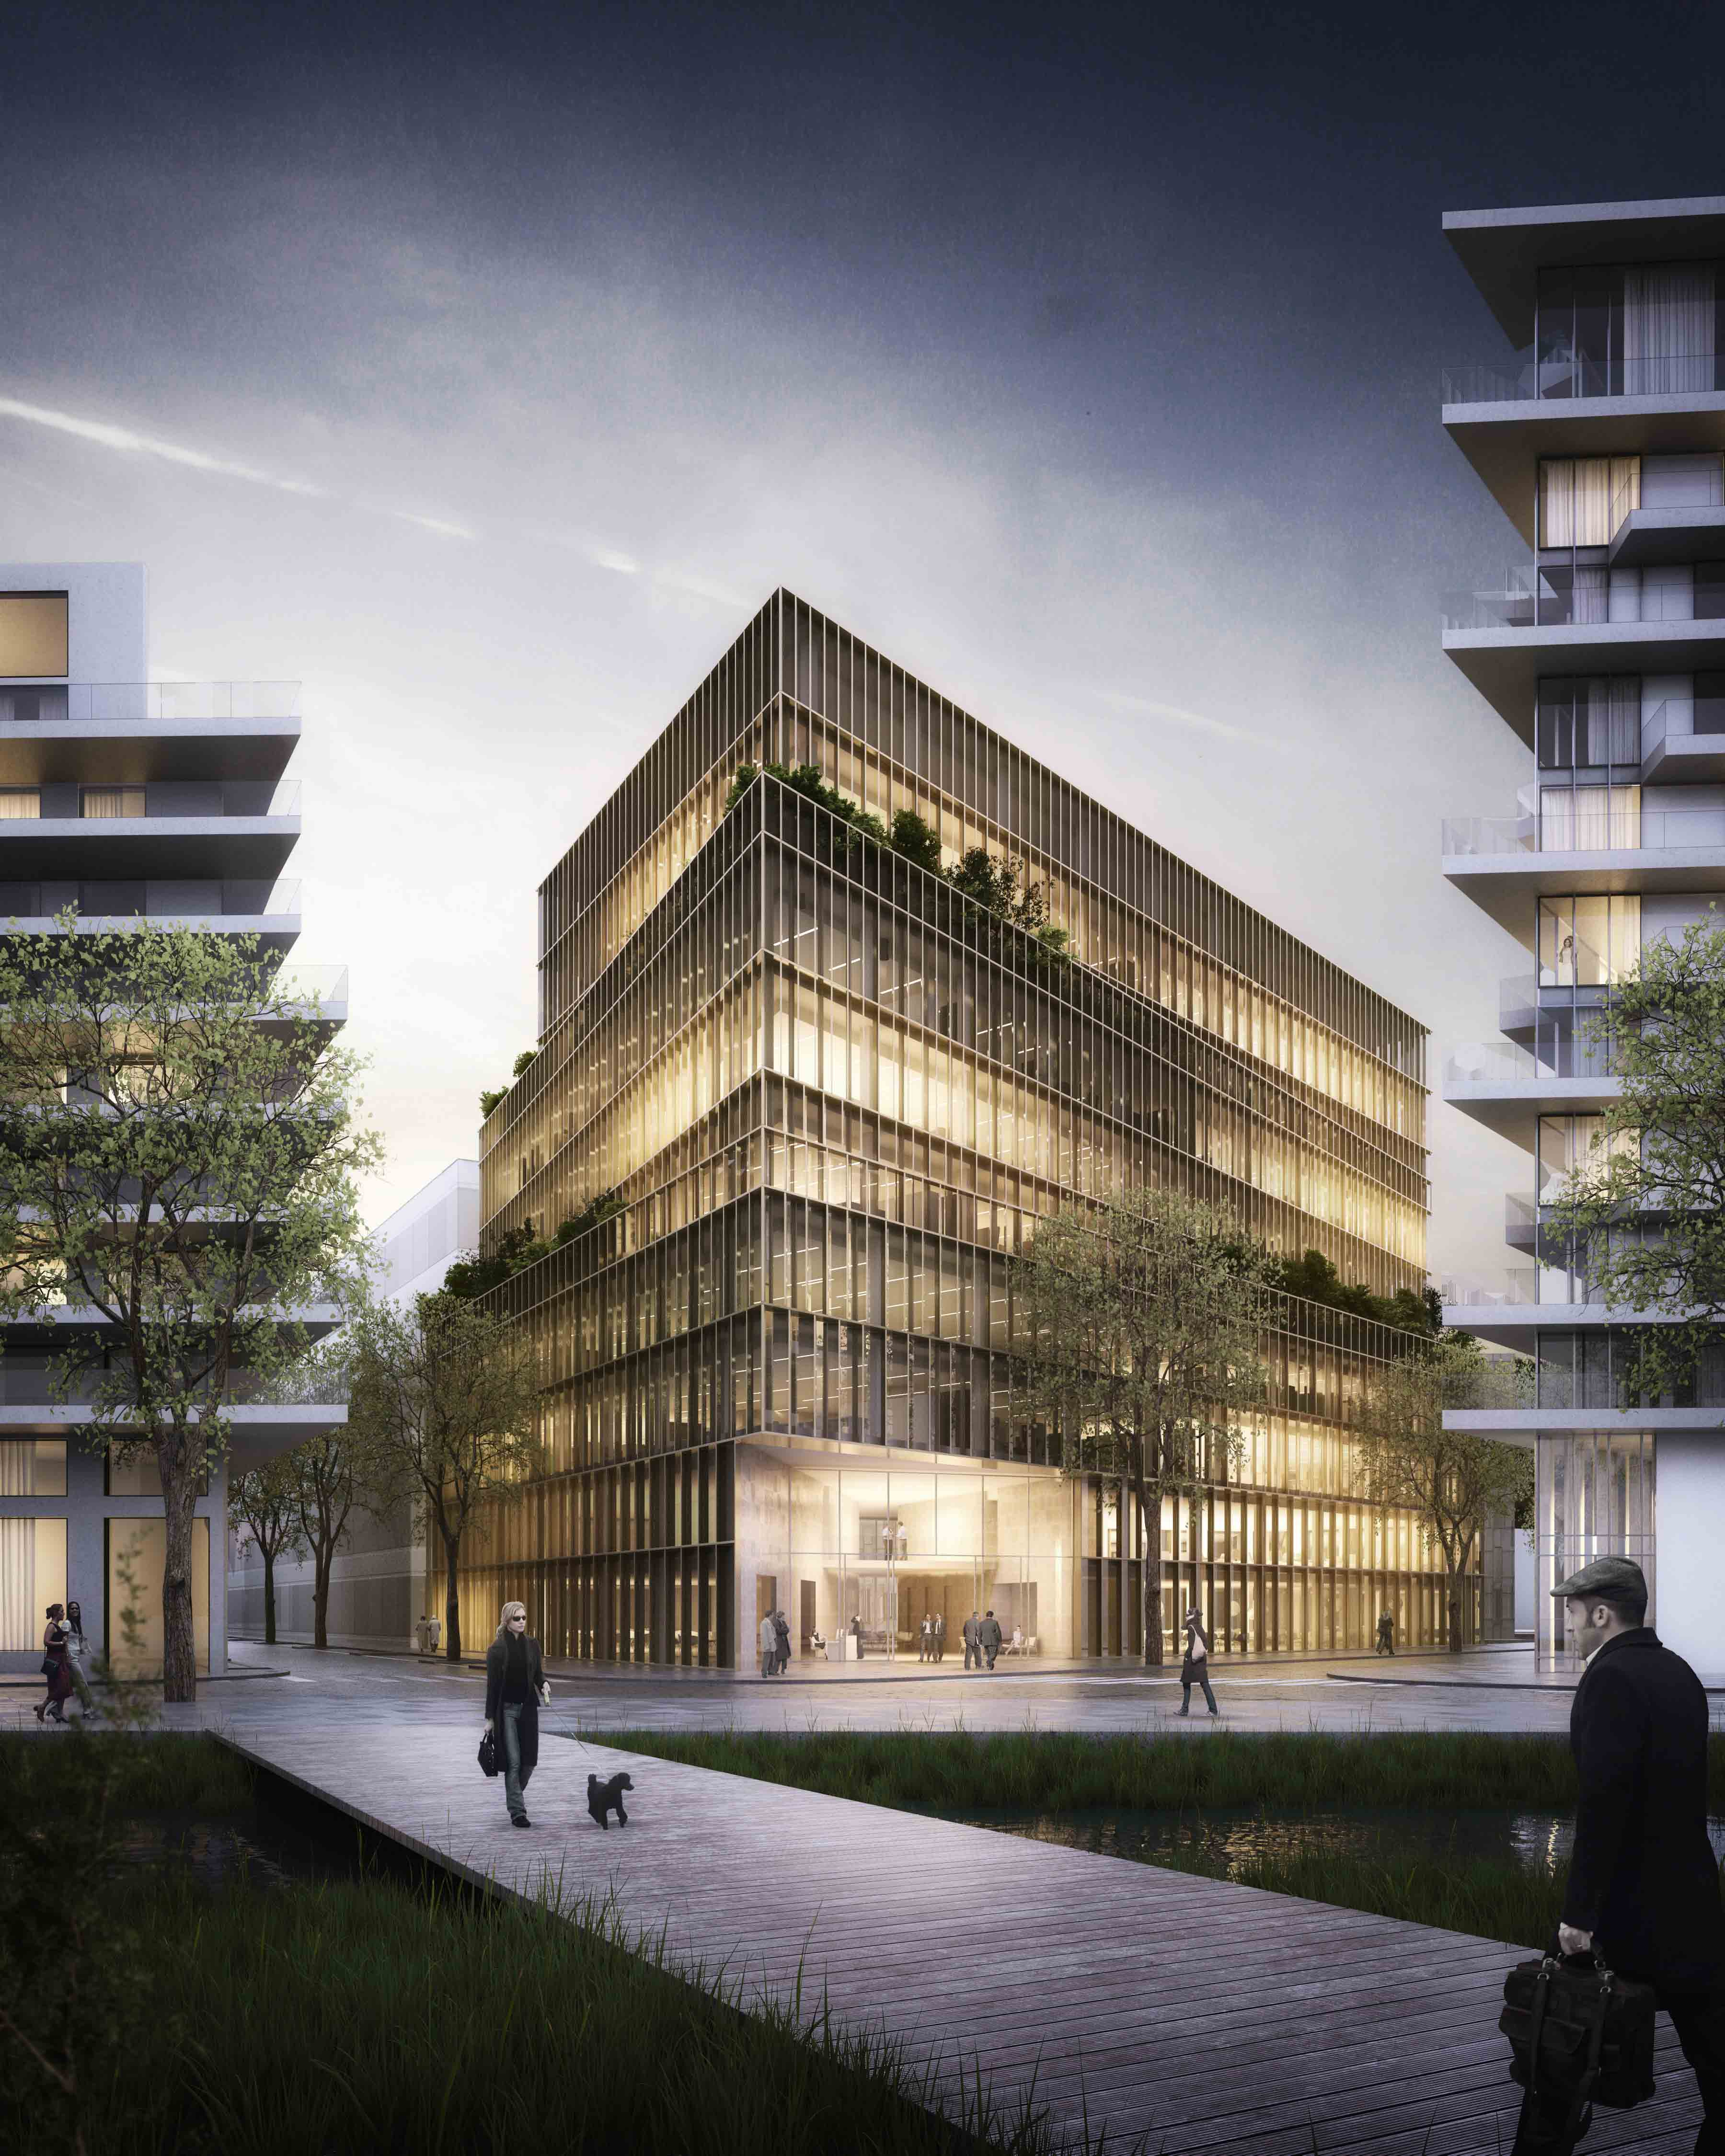 Proposta Vencedora para Edifício de Escritórios Kaufman & Broad / Studioninedots, © A2STUDIO